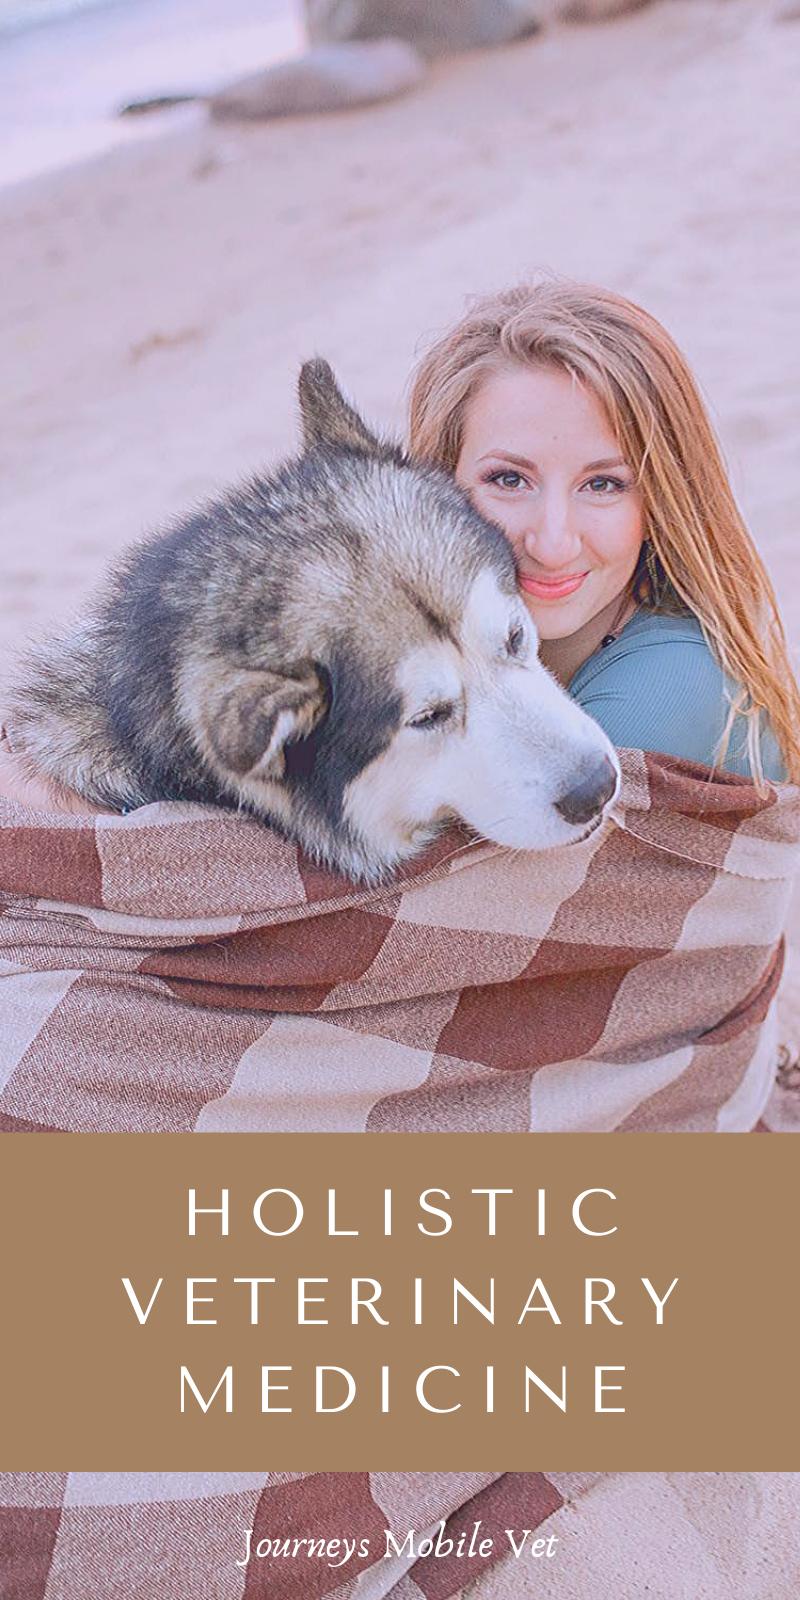 Holistic Veterinary Medicine In 2020 Holistic Veterinary Pets Veterinary Services